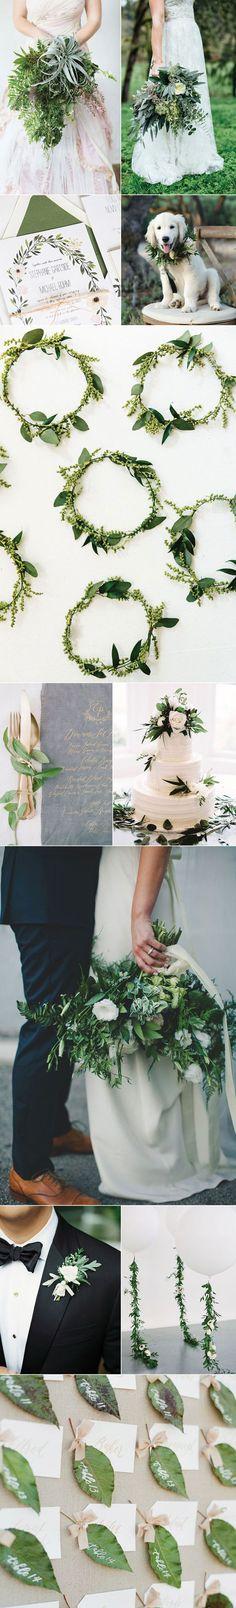 Ideas For a Pantone Greenery Wedding